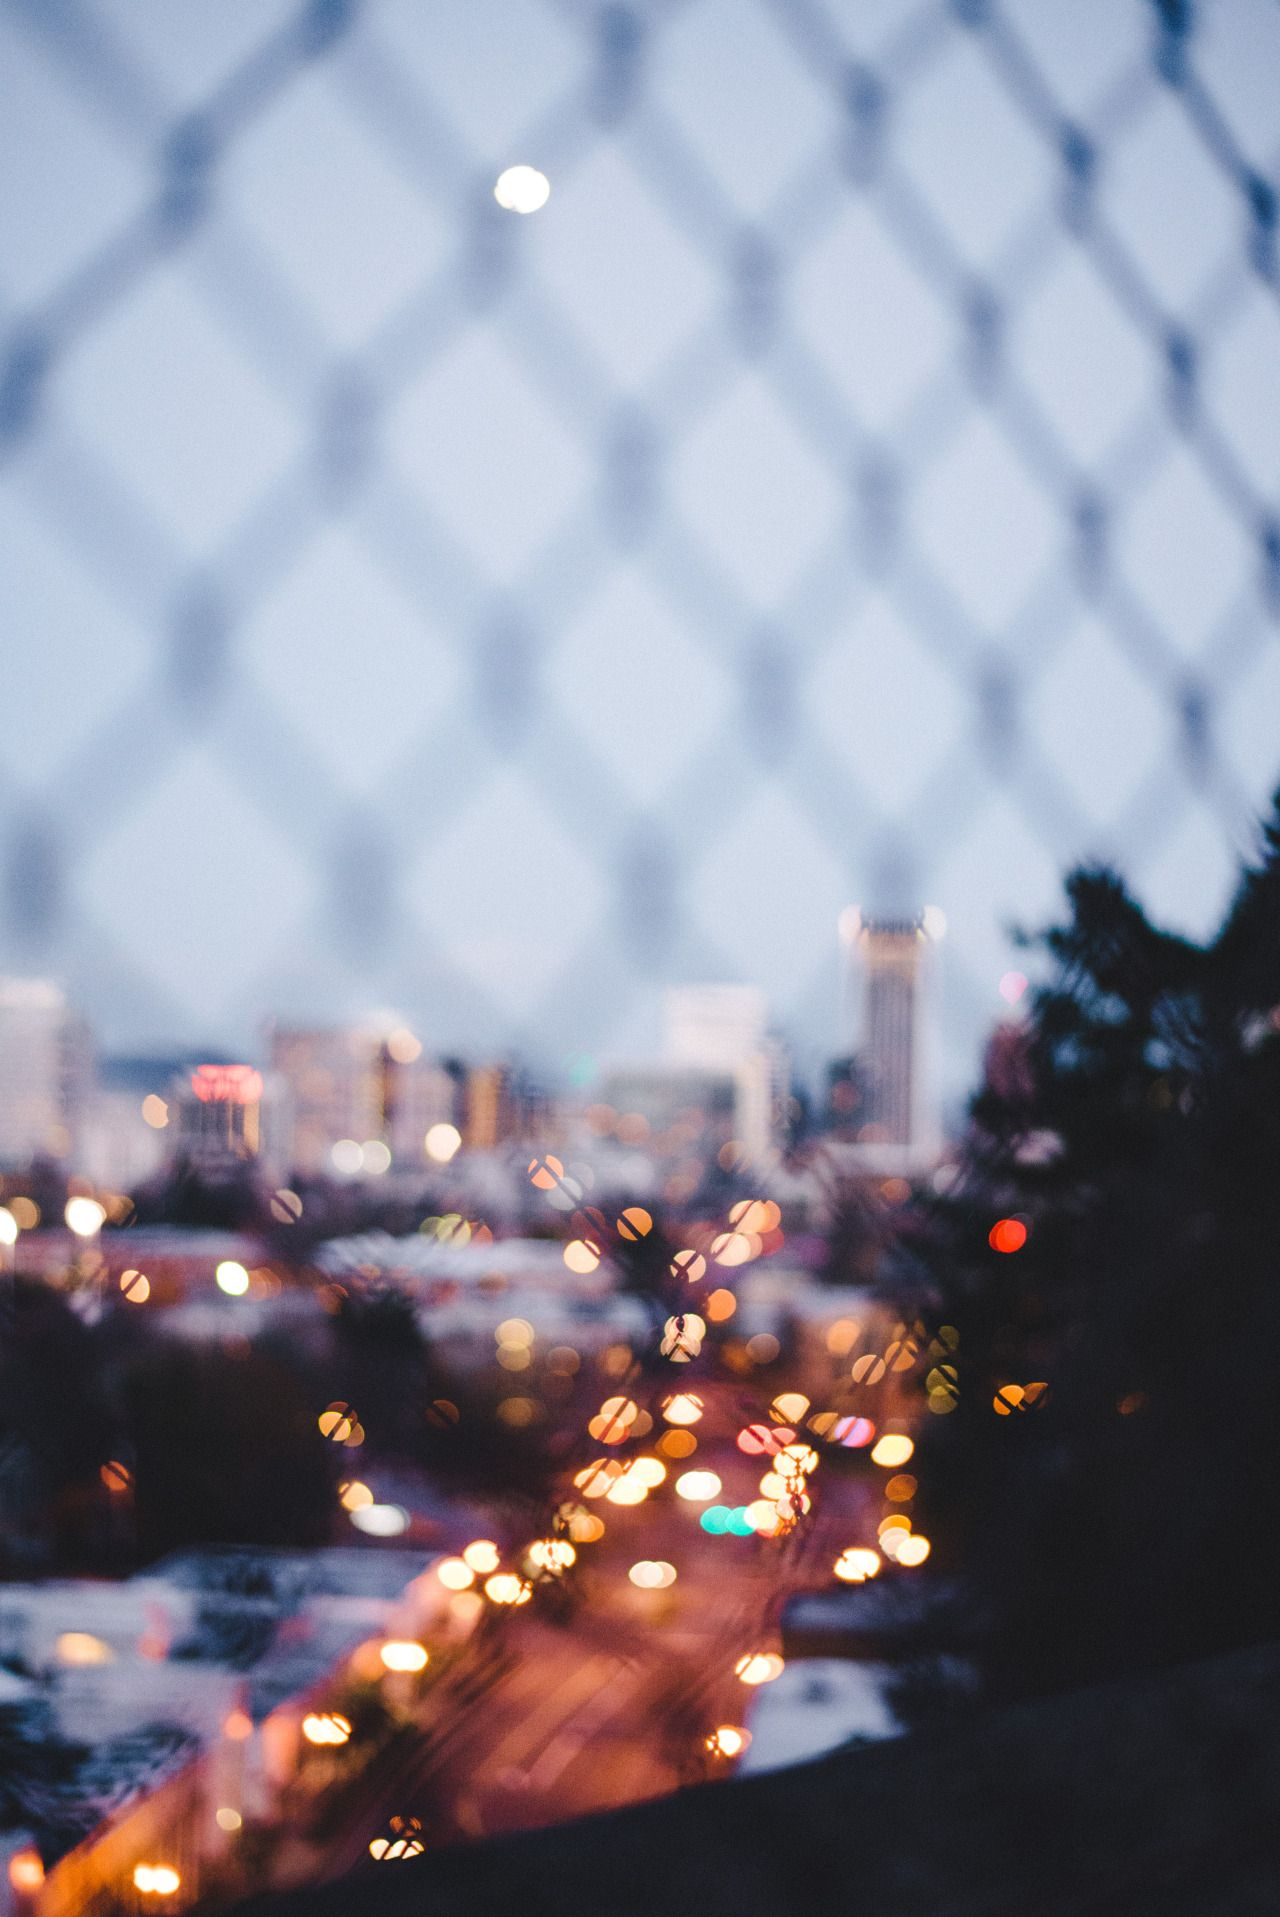 Huawei Enjoy 10s Wallpapers City Lights Wallpaper Scenery Wallpaper Sky Aesthetic